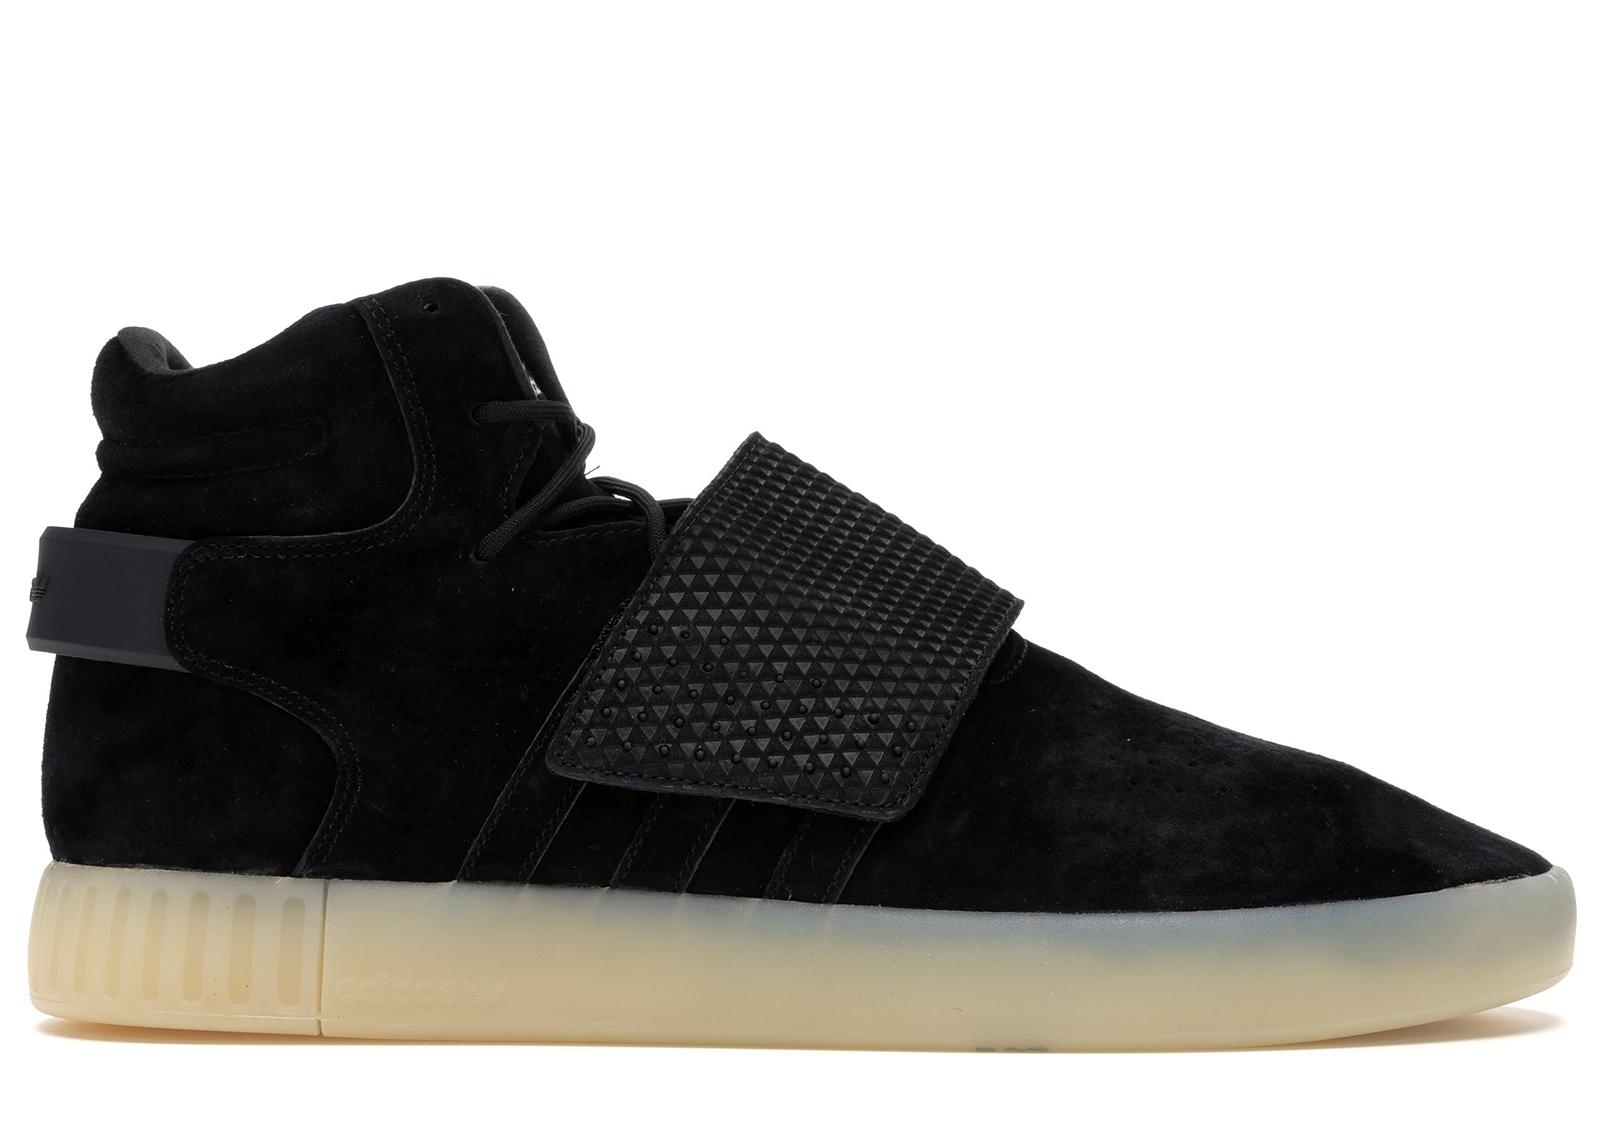 adidas Tubular Invader Strap Black/Black-White